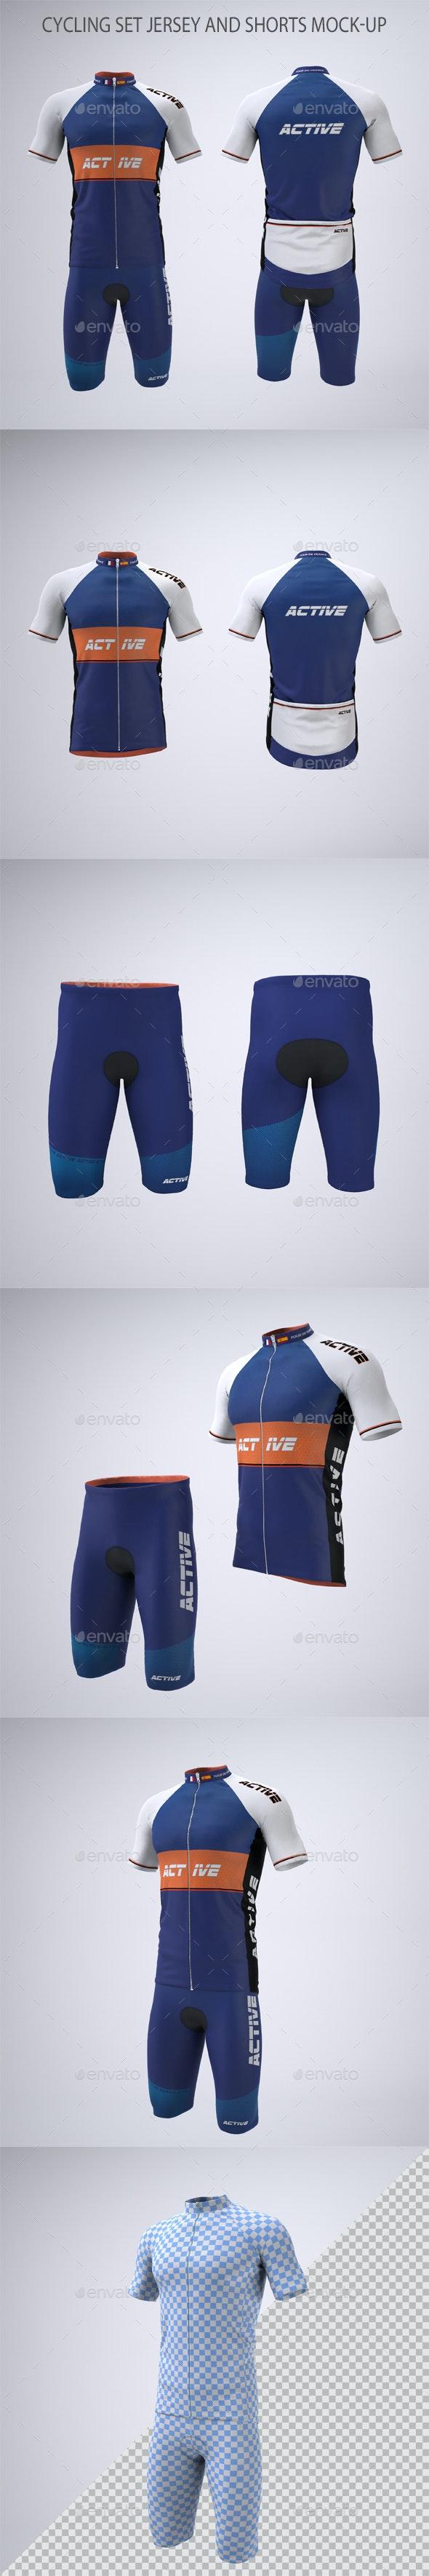 Cycling Set Jersey and Shorts Mock-up - Apparel Product Mock-Ups